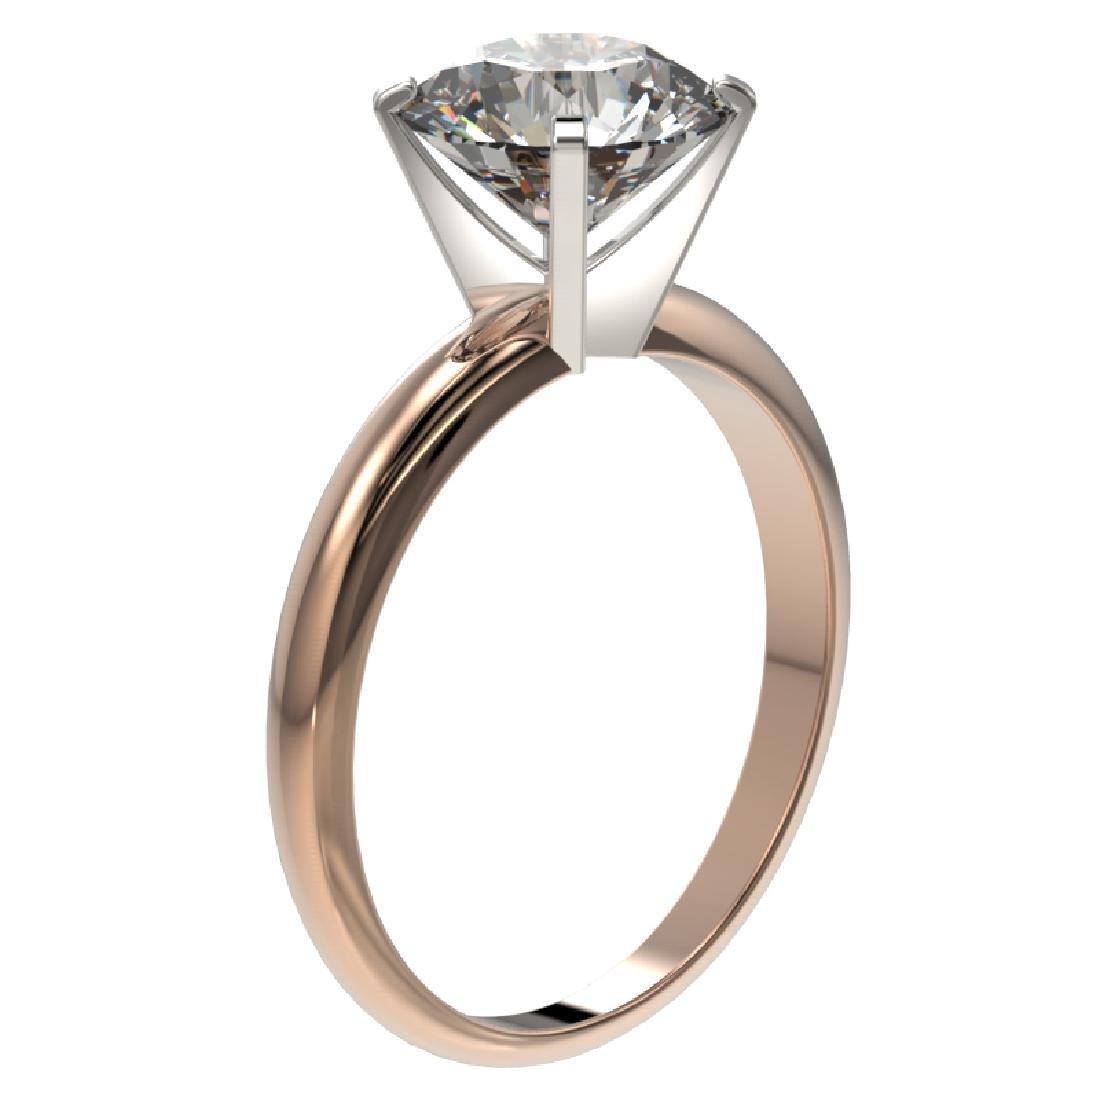 2.50 CTW Certified G-SI Diamond Engagement Ring 10K - 3